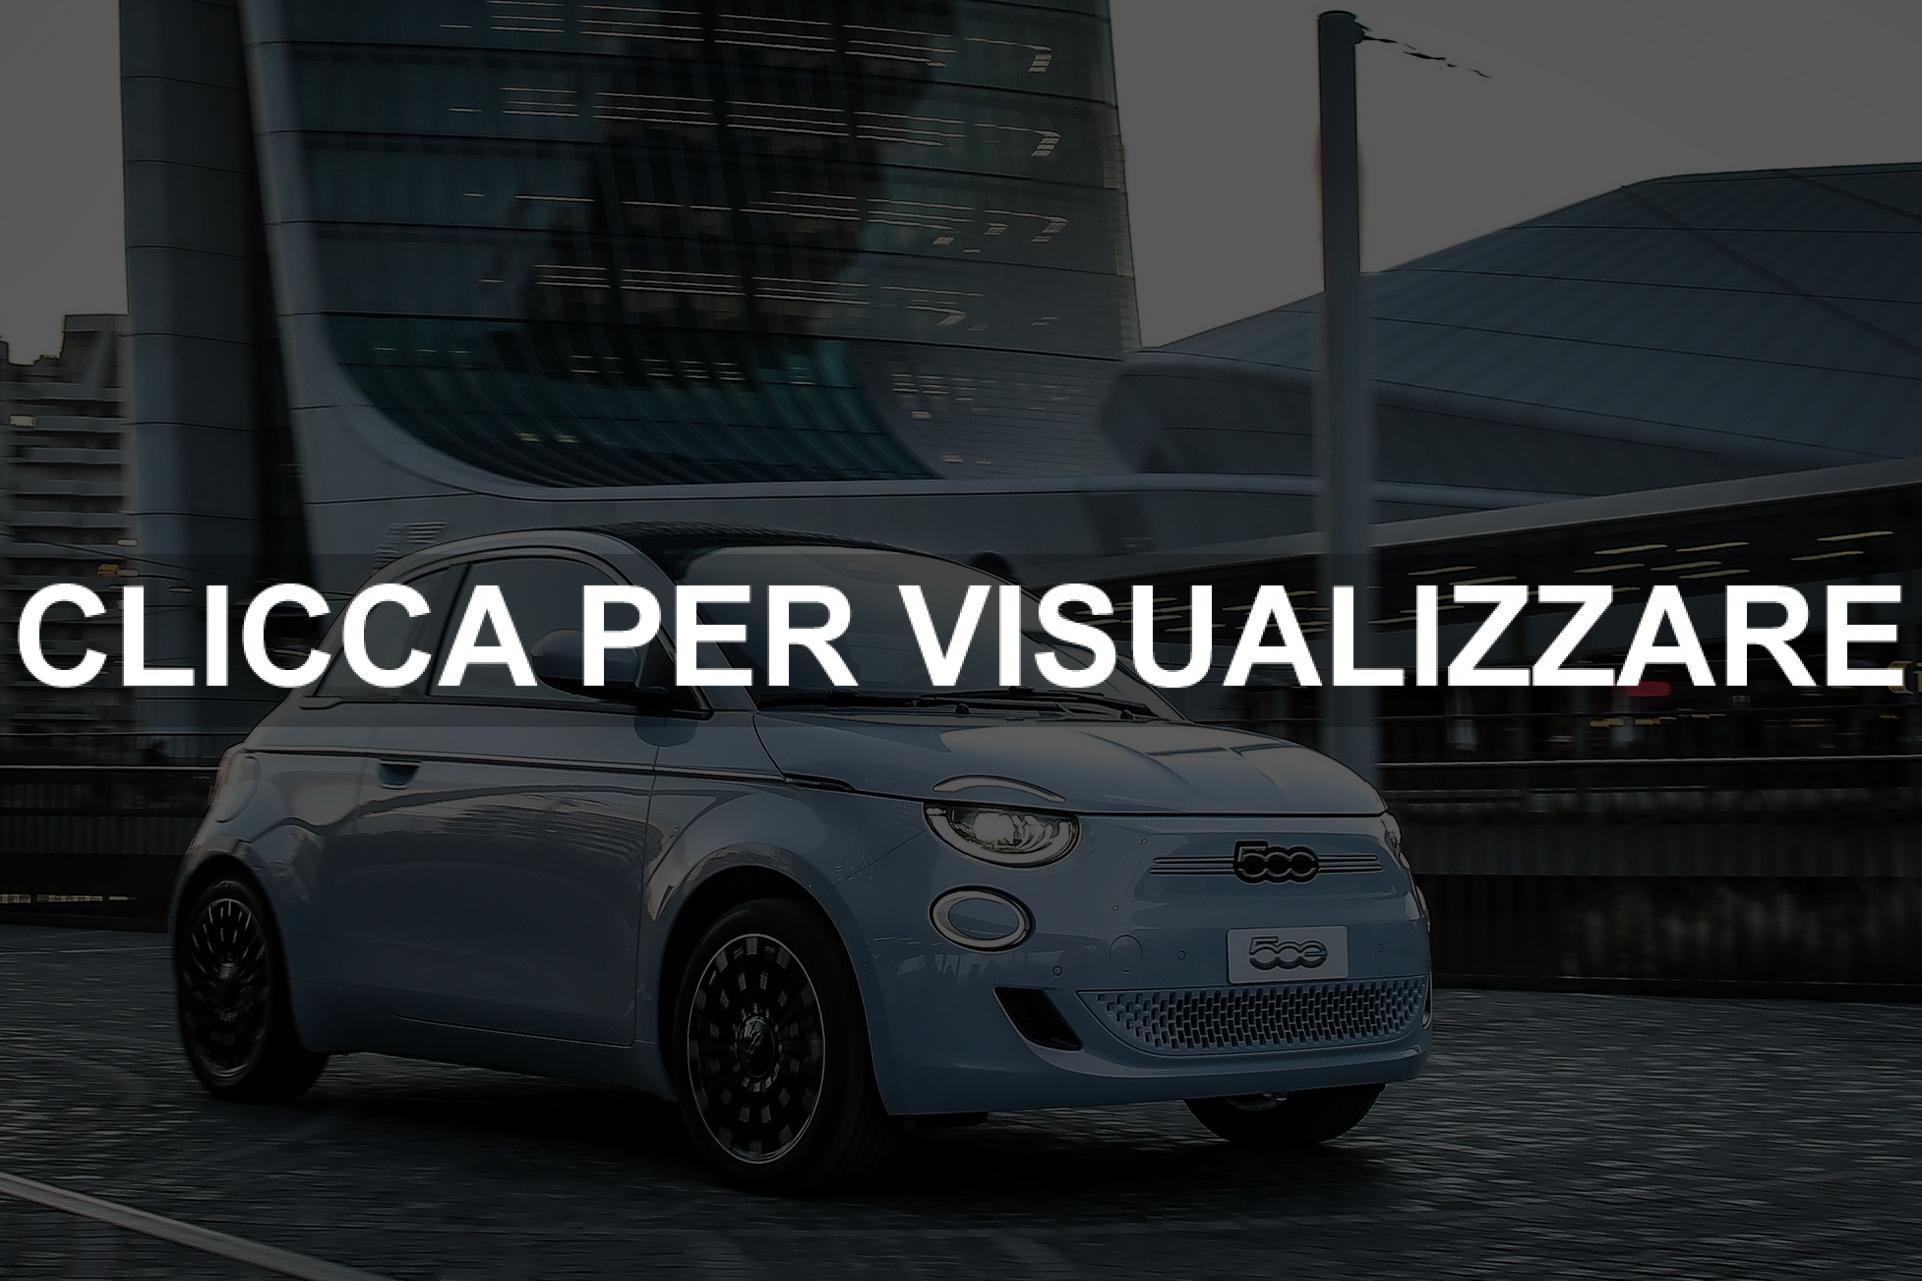 Nuova Fiat 500 elettrica Celeastial Blue